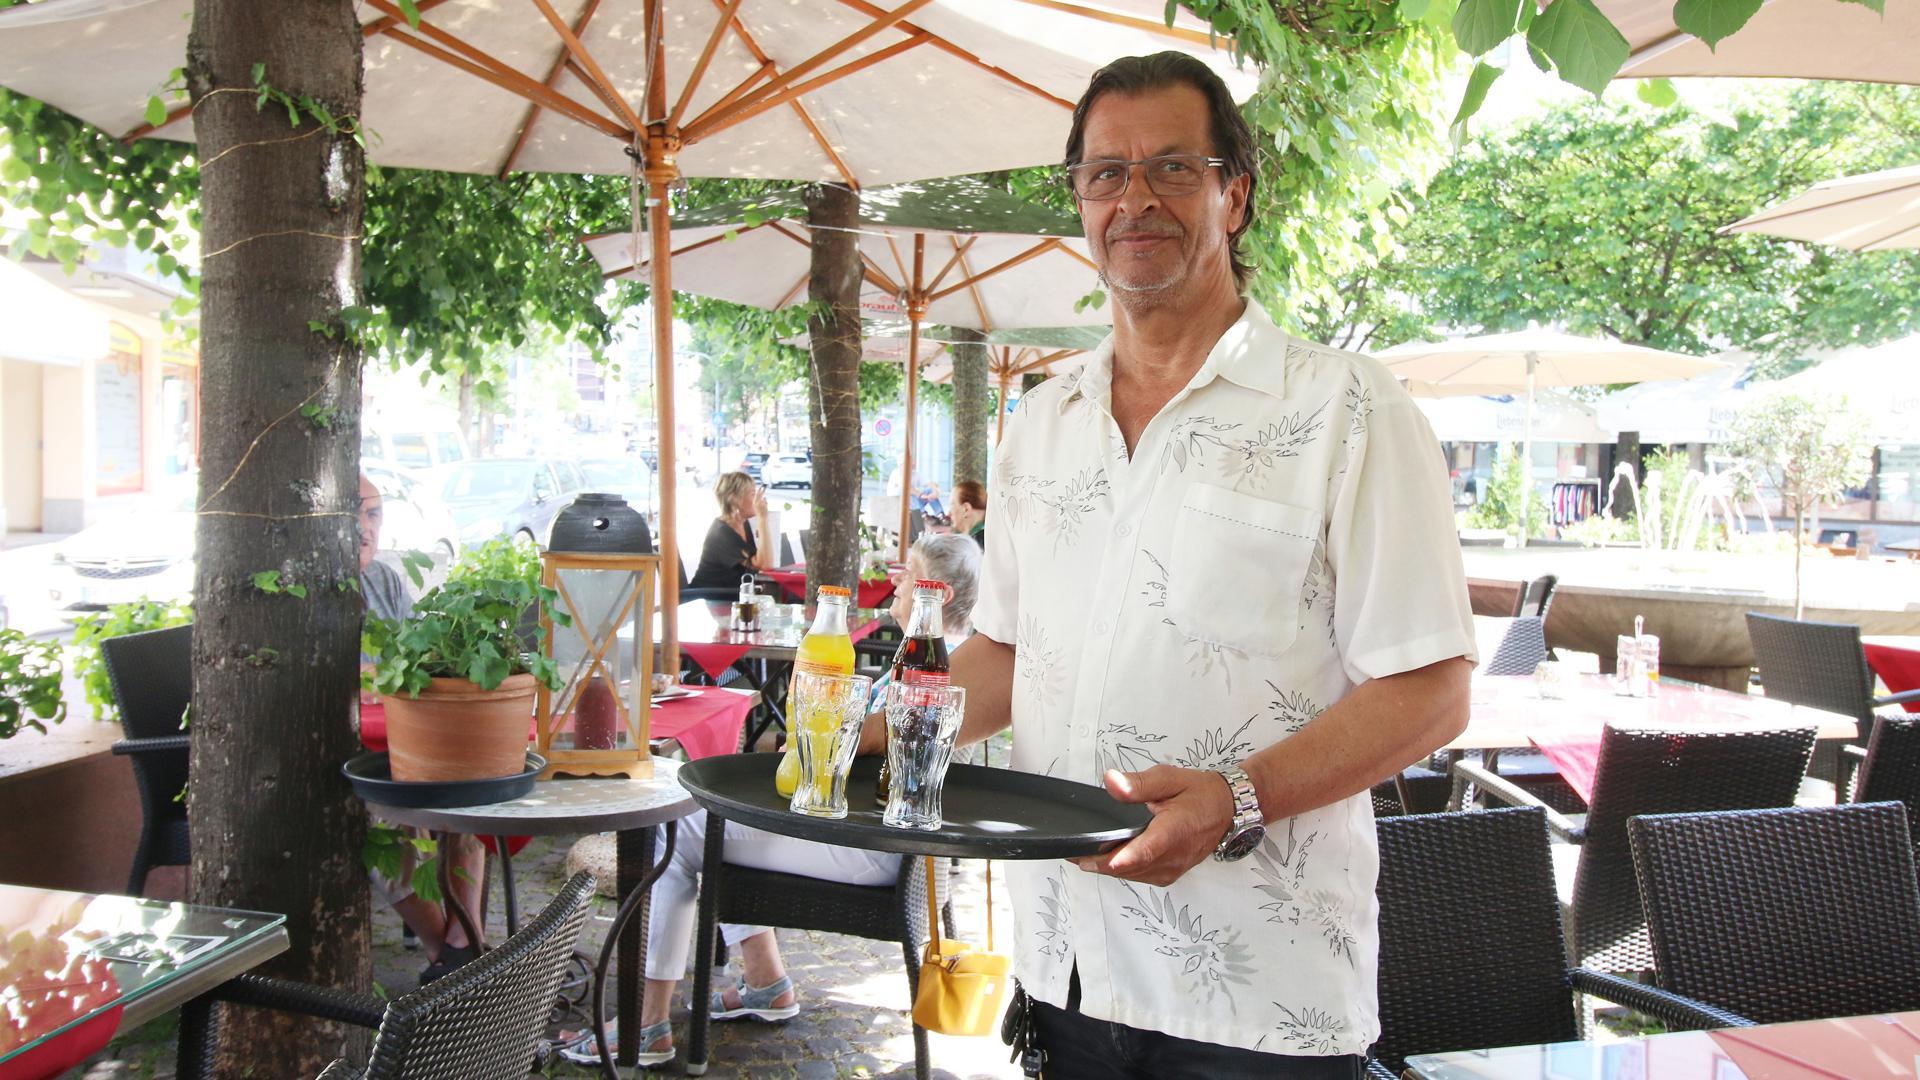 Norbert Kieselbach, La Piazza